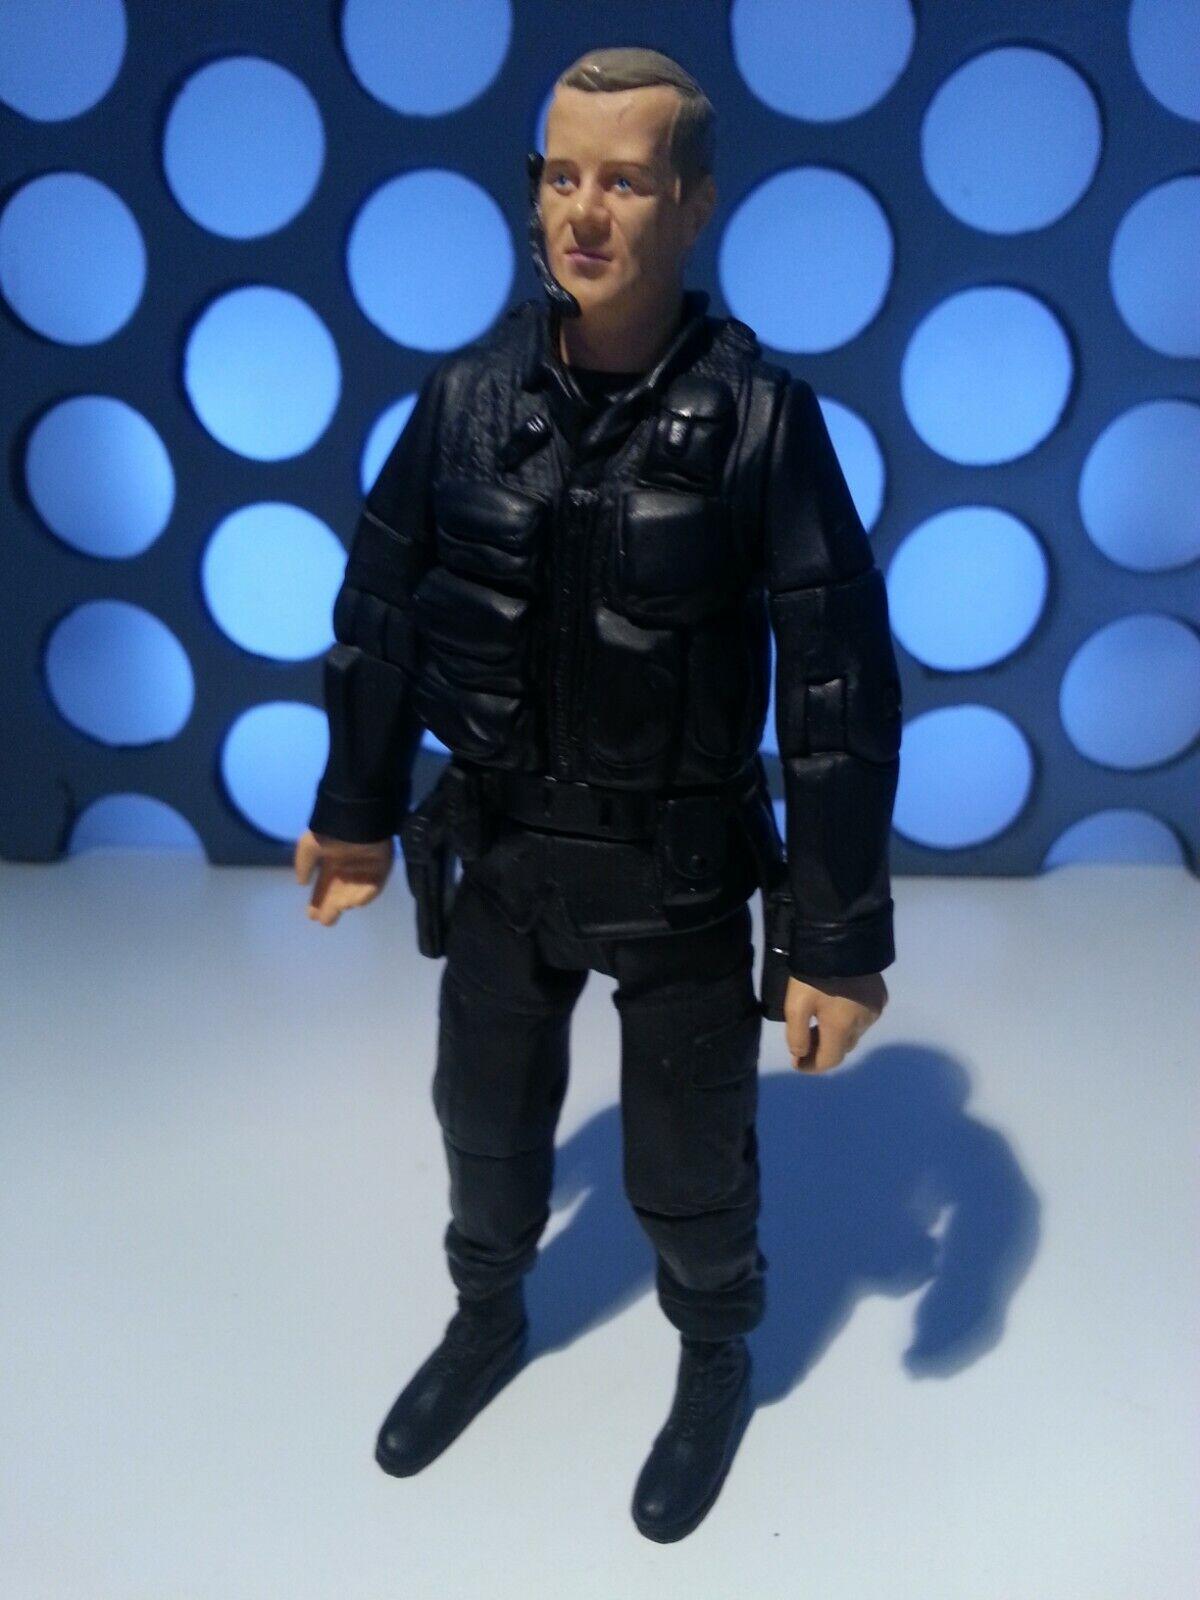 Primeval Tom Ryan 5 Action Figure ITV Cult TV Series - £7.99